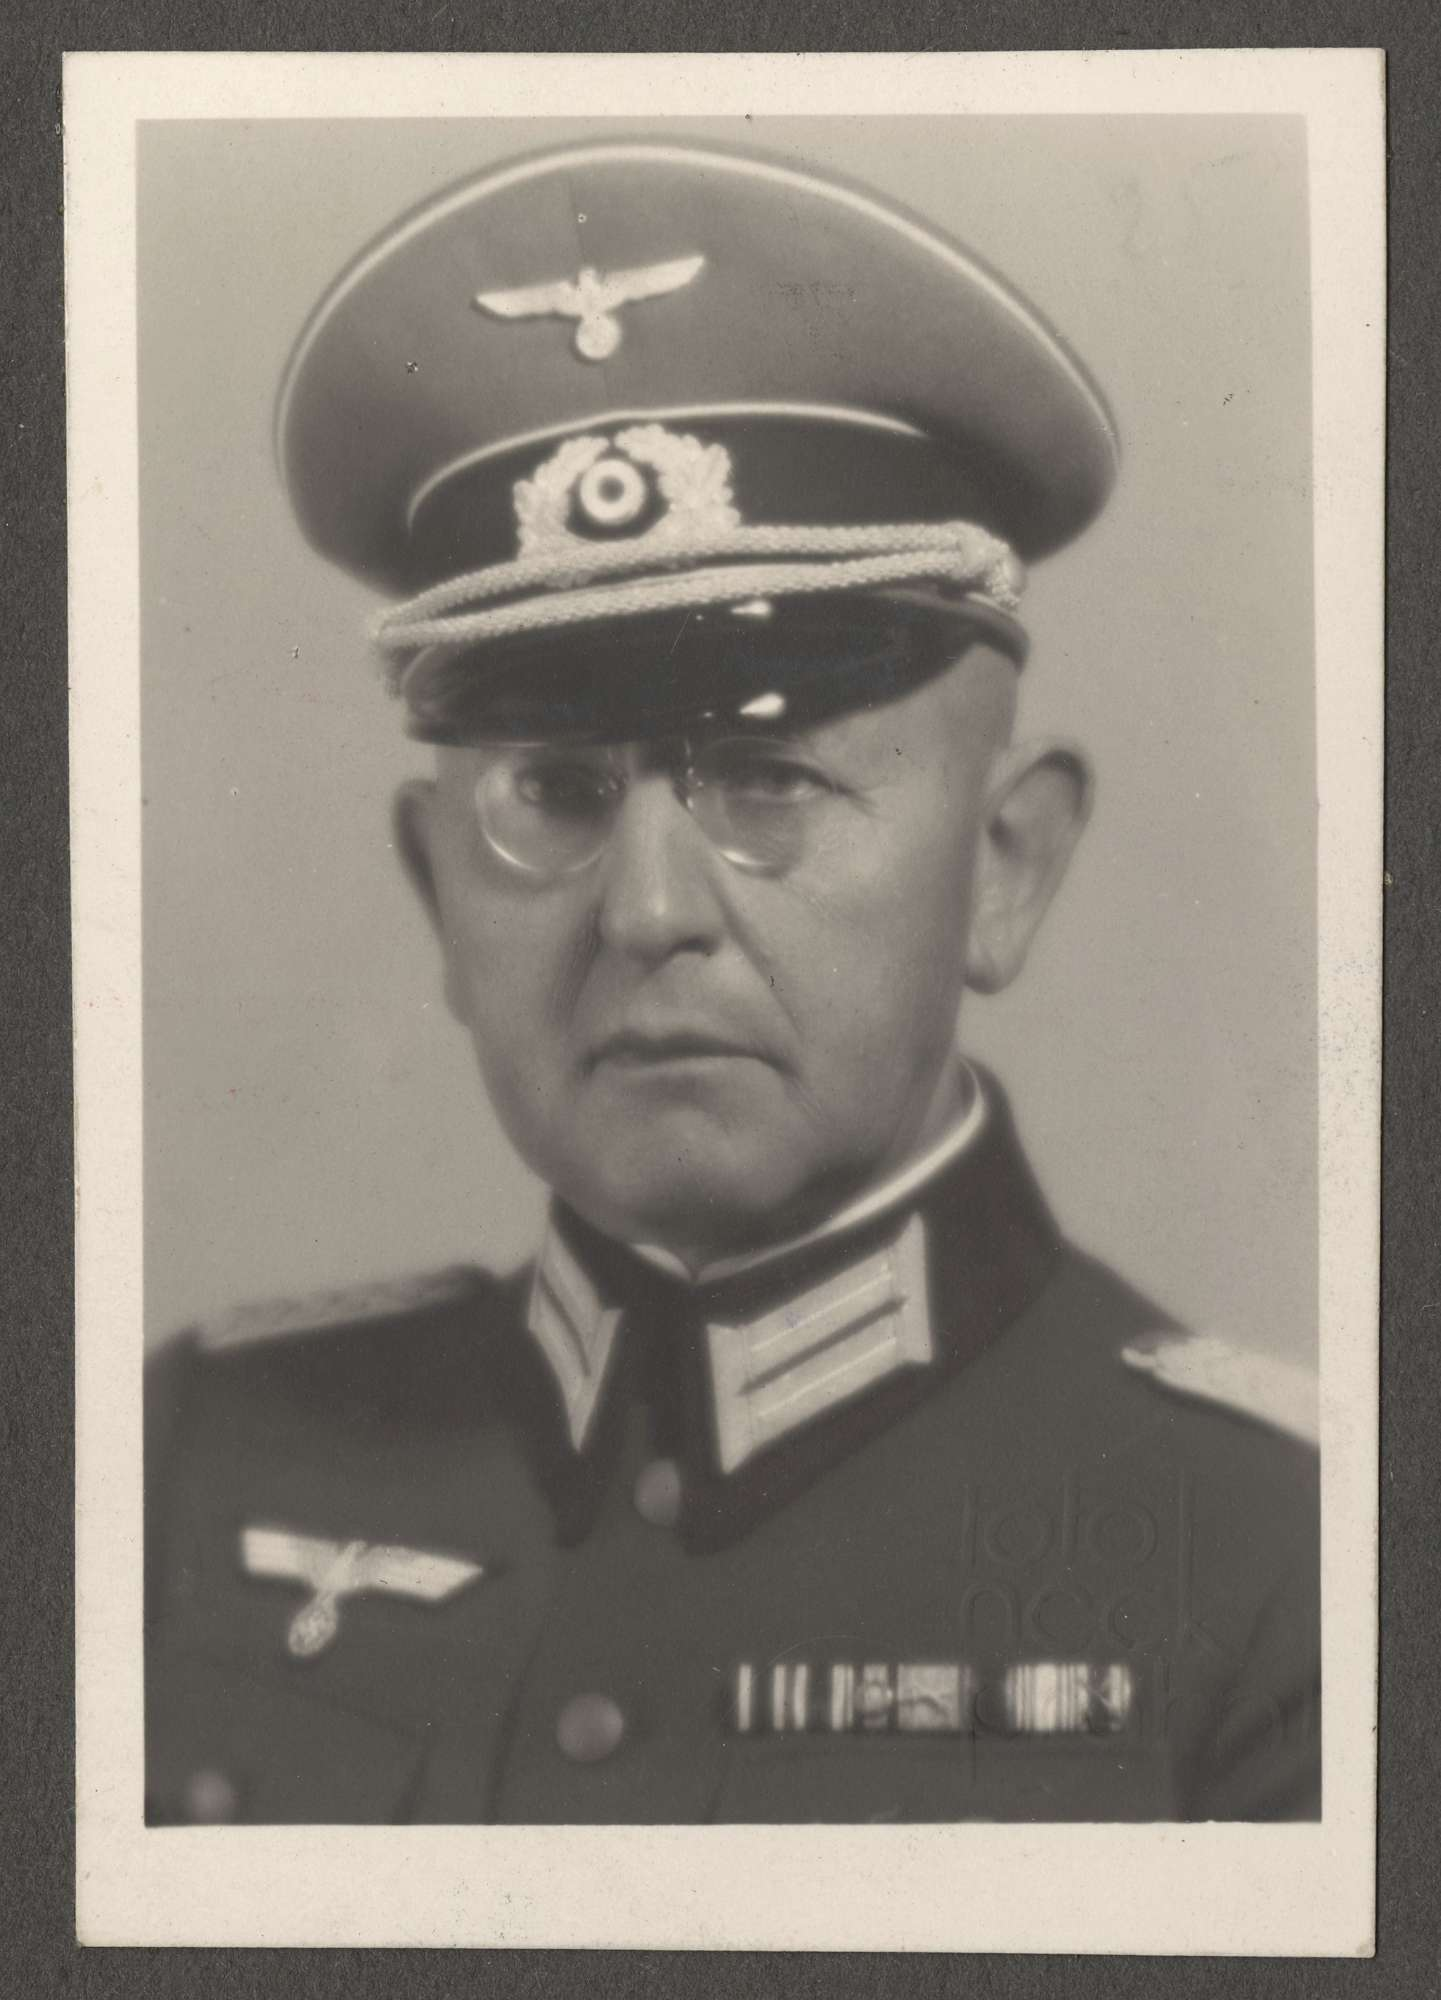 Majer-Frendel, Hans, Bild 1